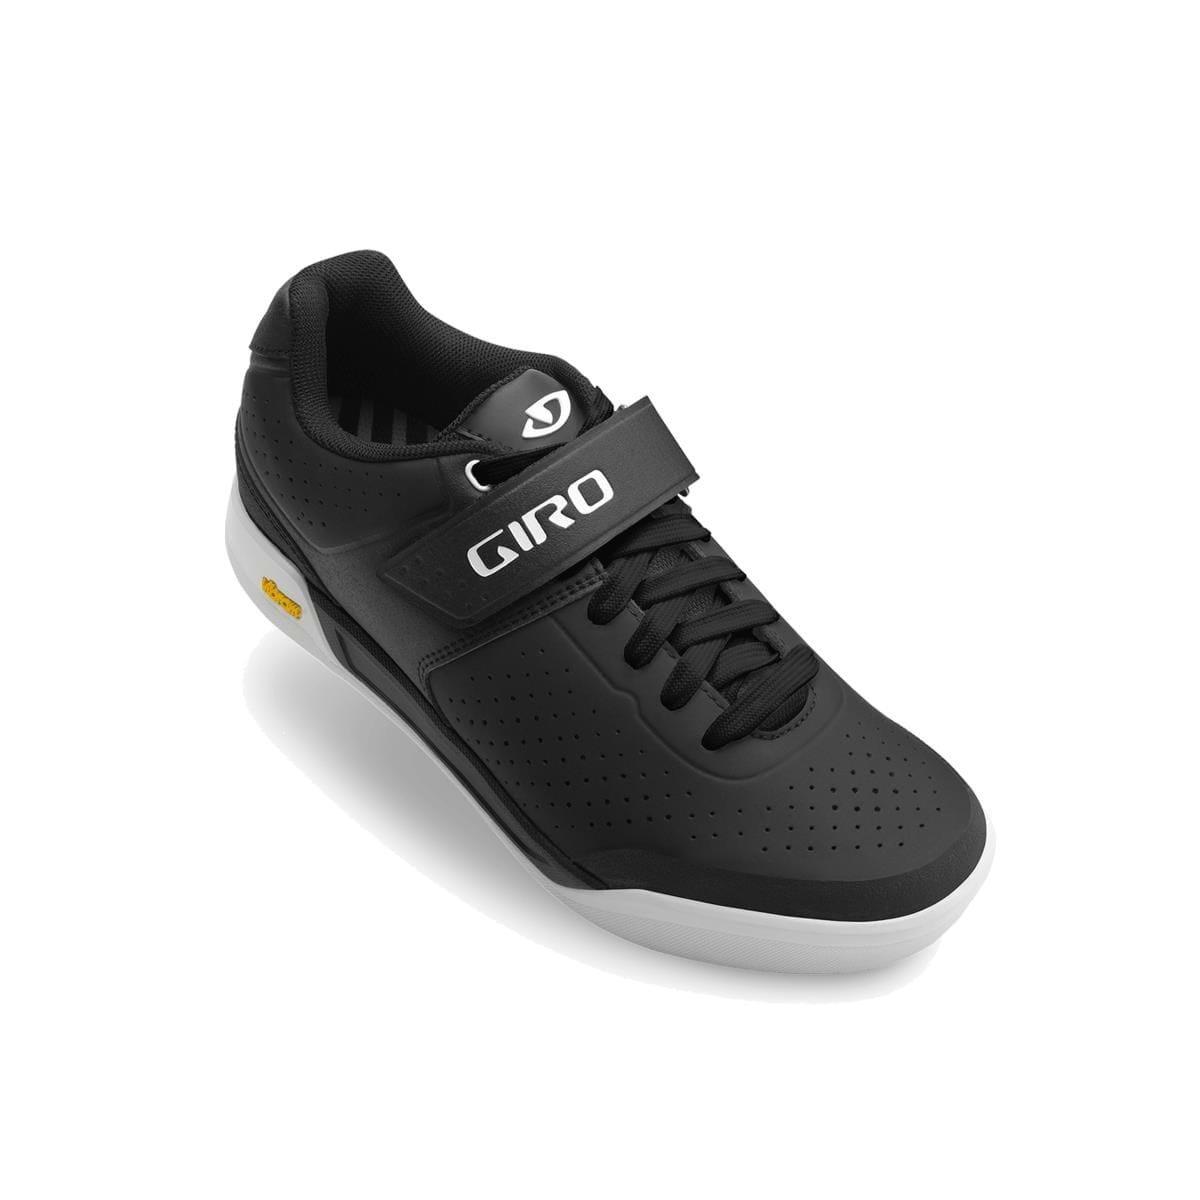 Chamber II MTB Shoes